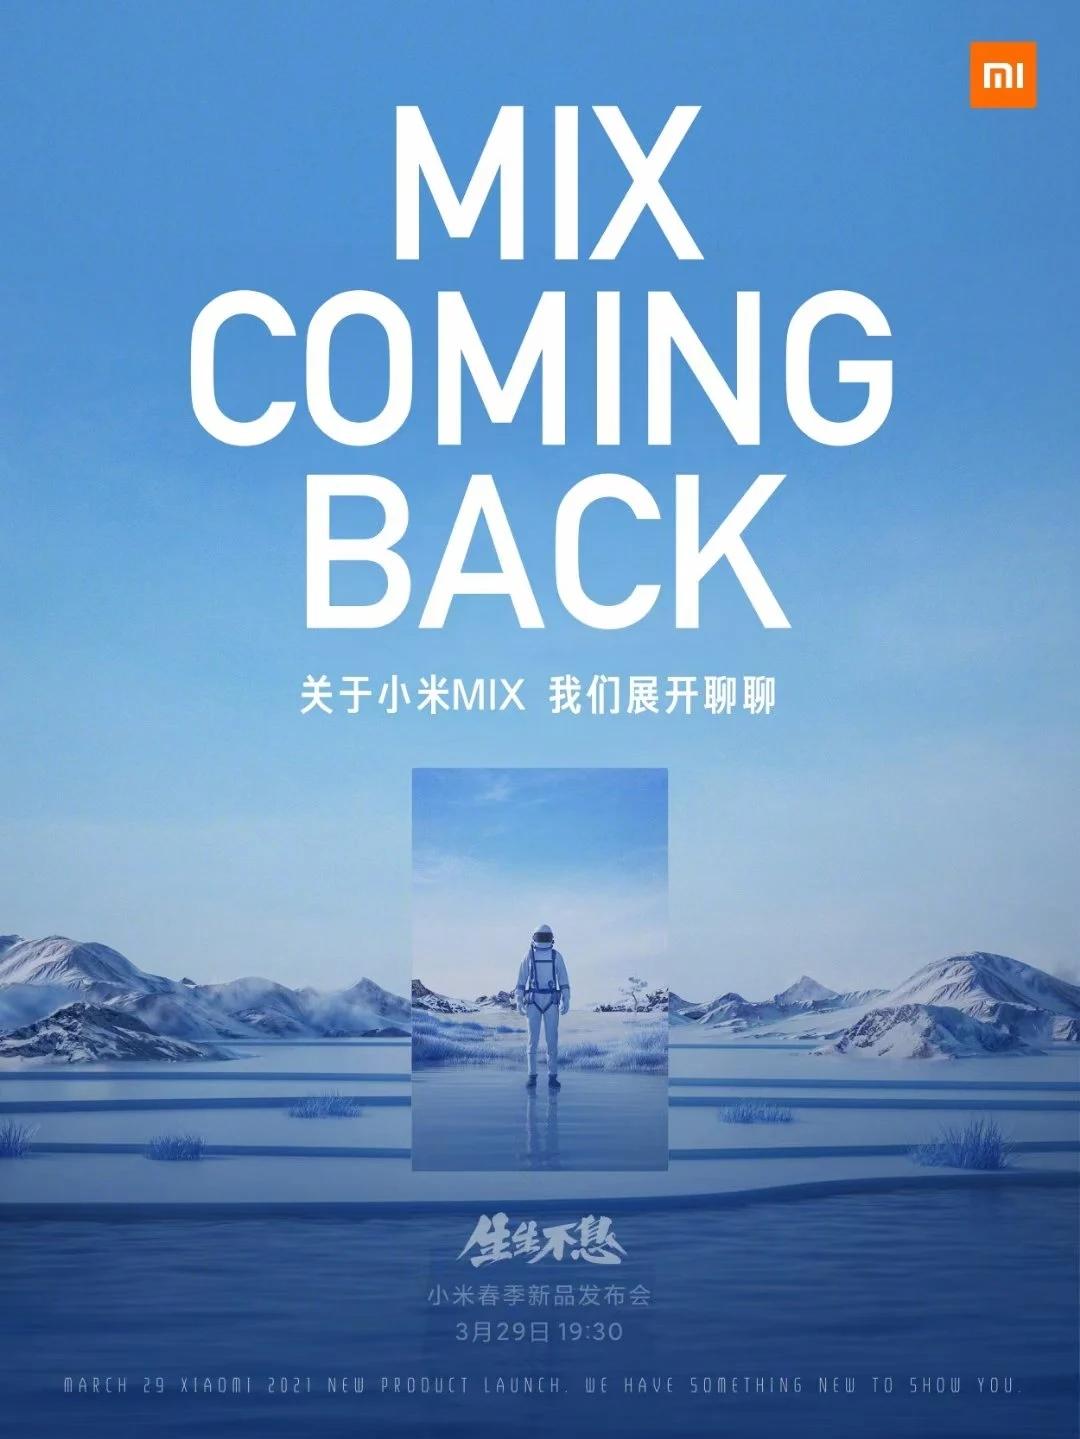 xiaomi-mi-mix-launch